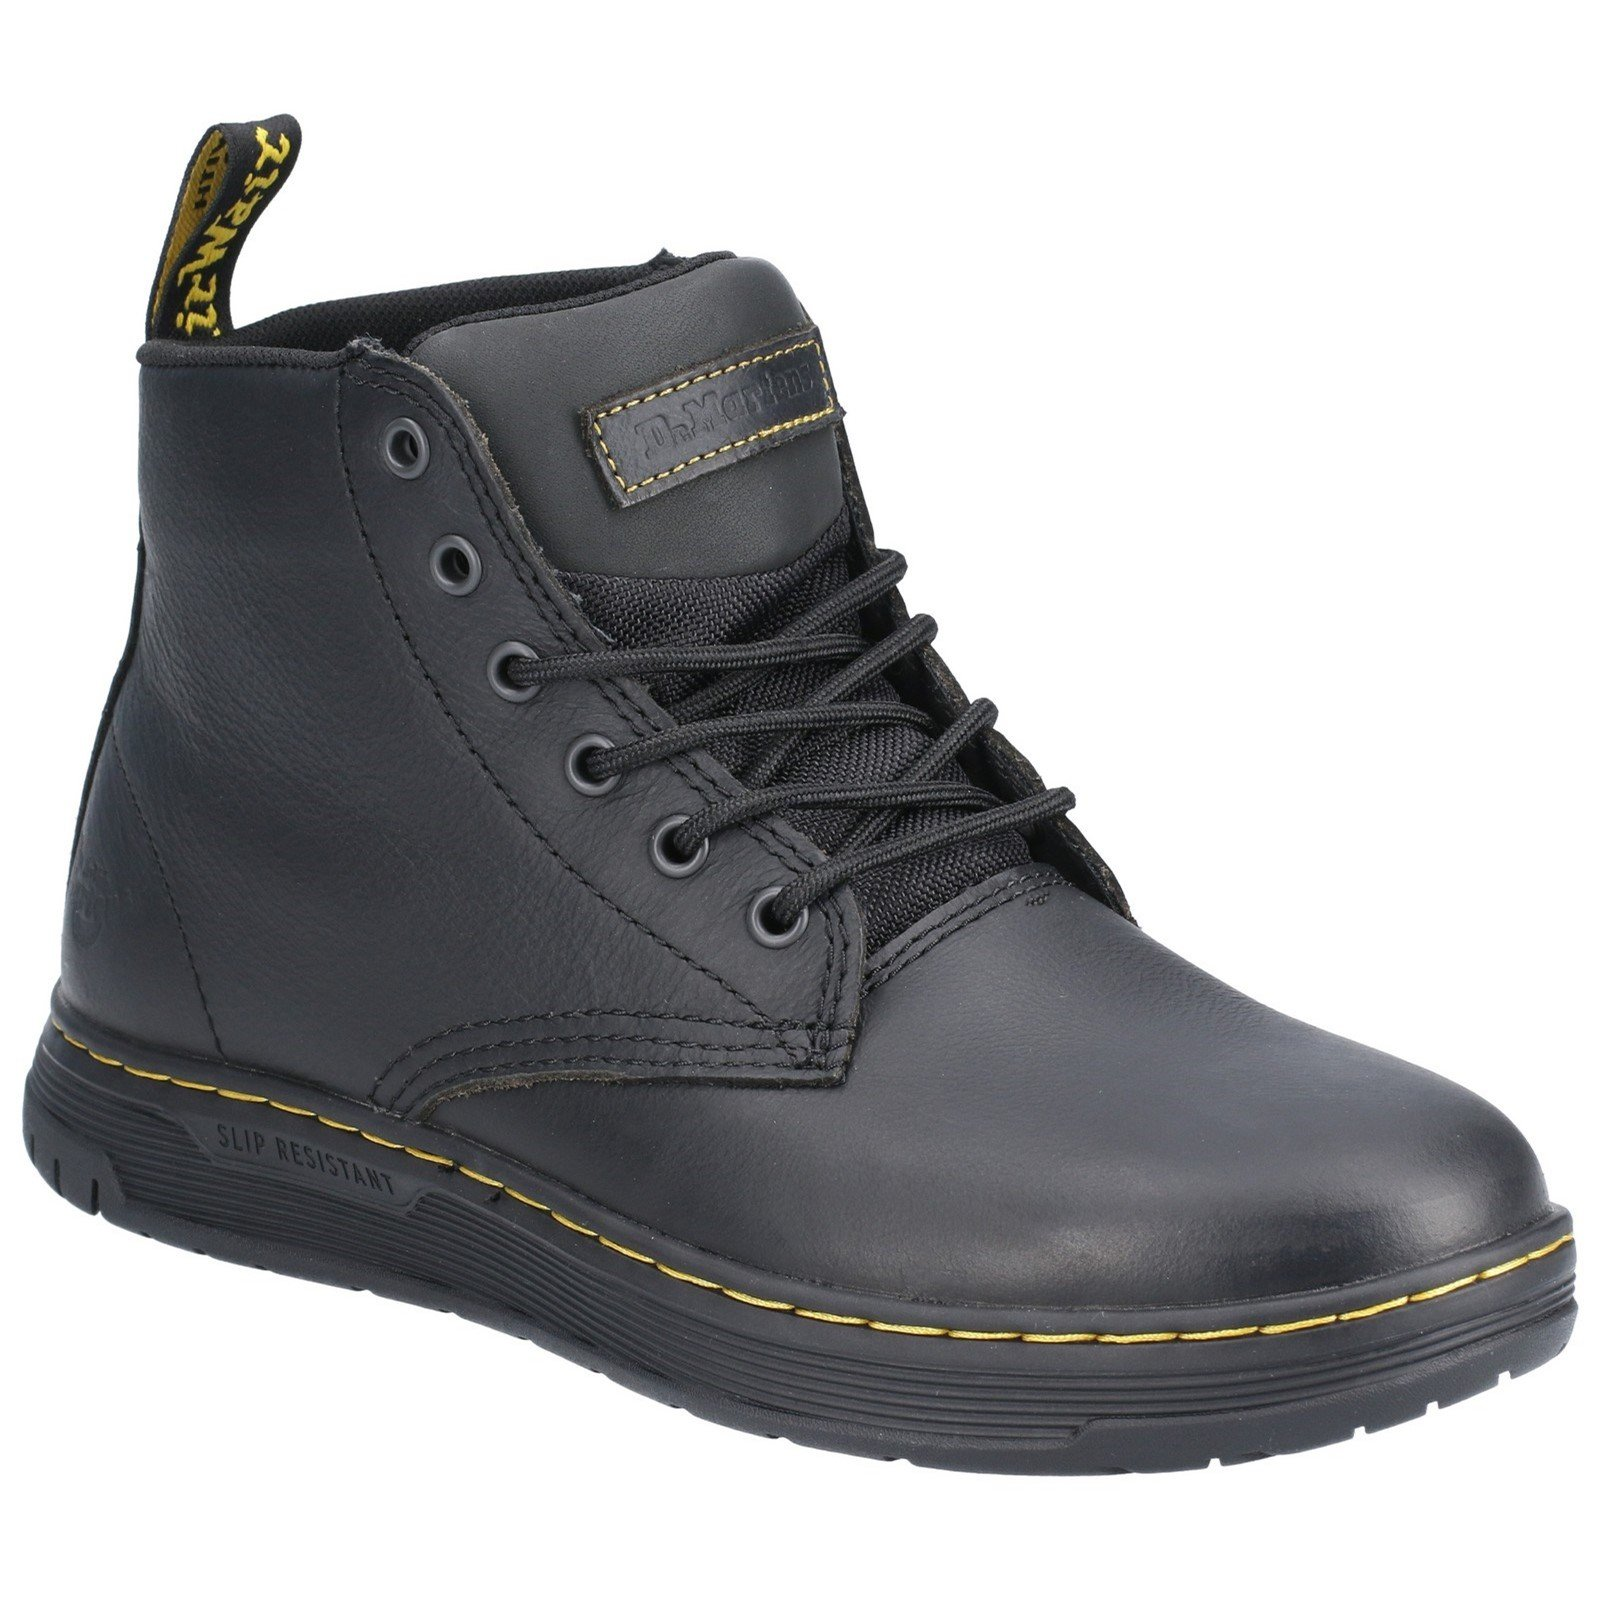 Dr Martens Men's Amwell Slip Resistant Leather Boot Black 29508 - Black 6